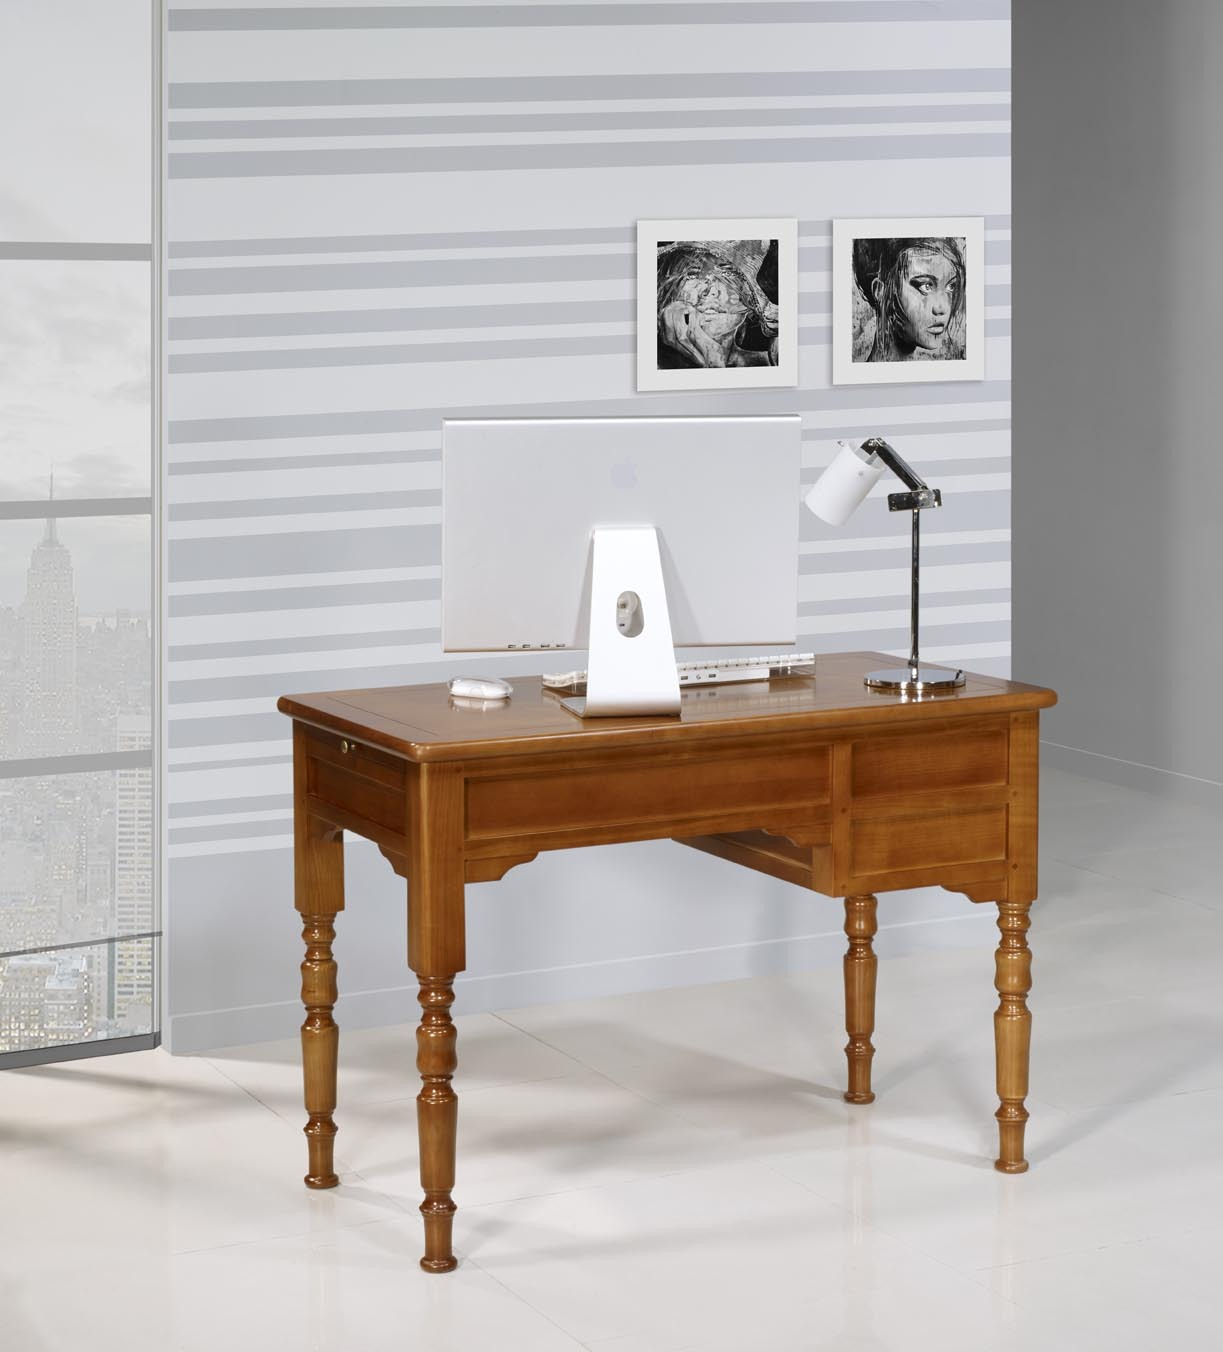 Mesa escritorio r my en madera maciza de cerezo estilo - Mesa escritorio madera ...